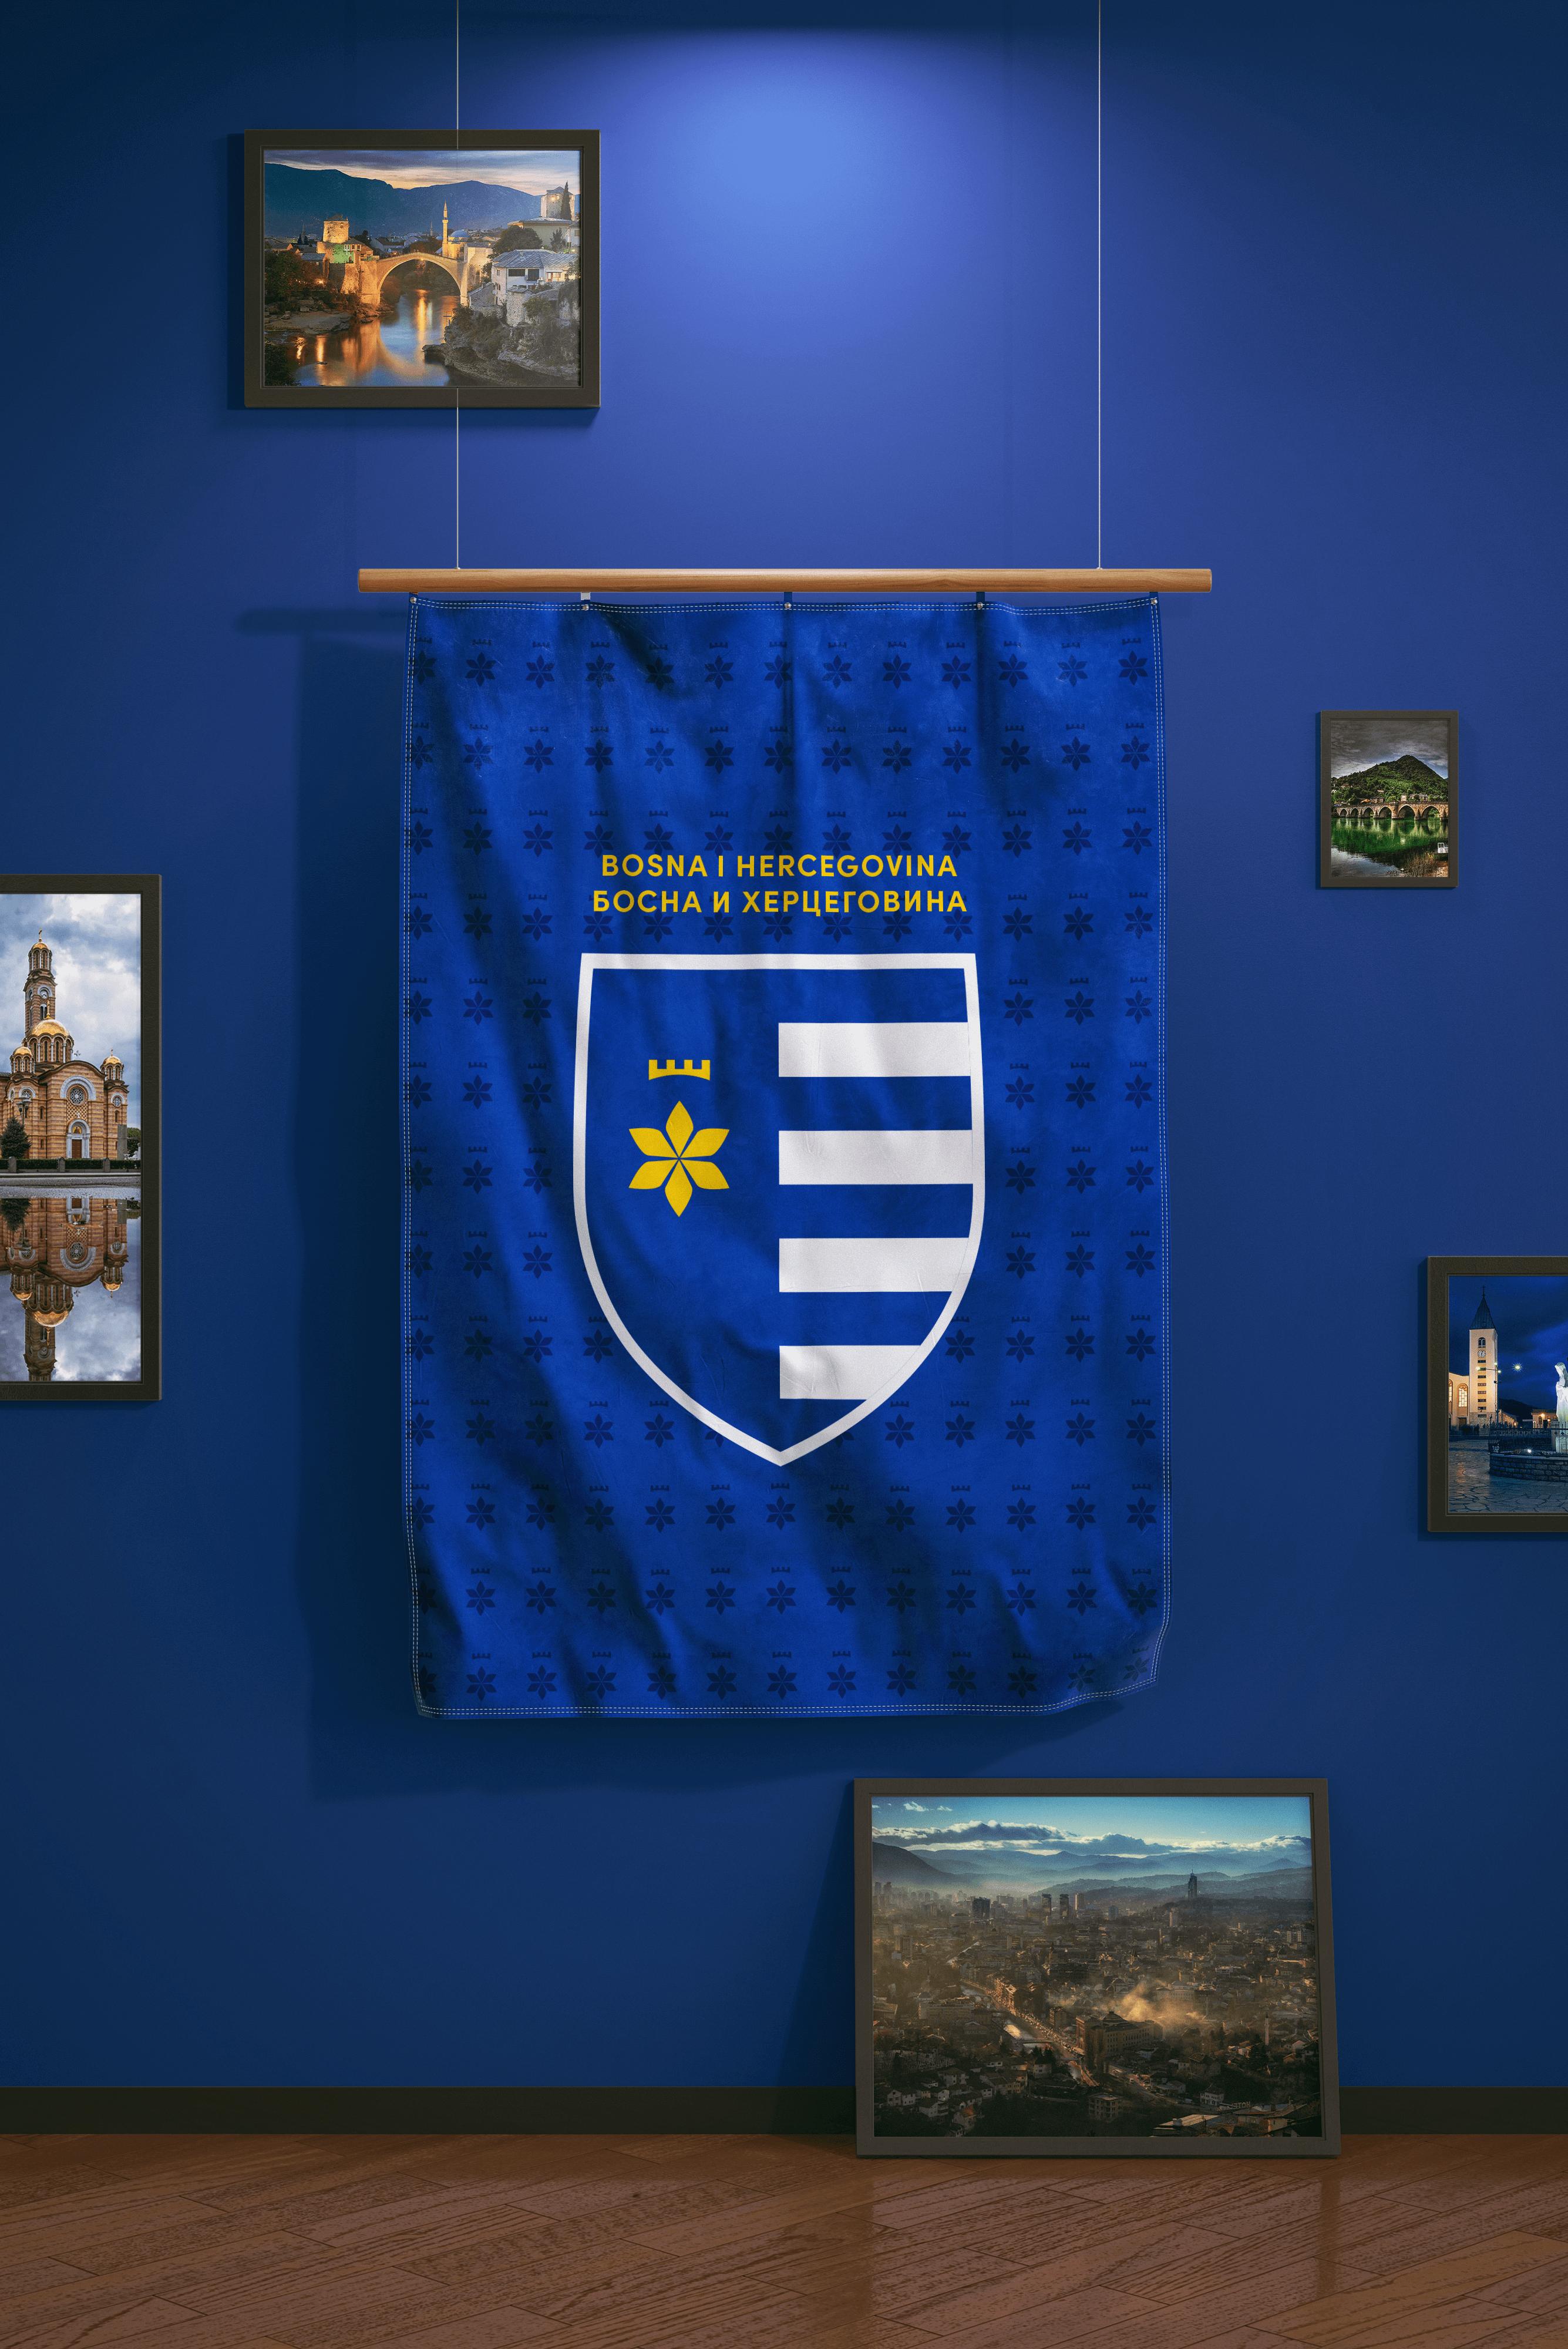 heysuho-denissuhopoljac-bih-flag-2019-Scene-7(coatofarms)